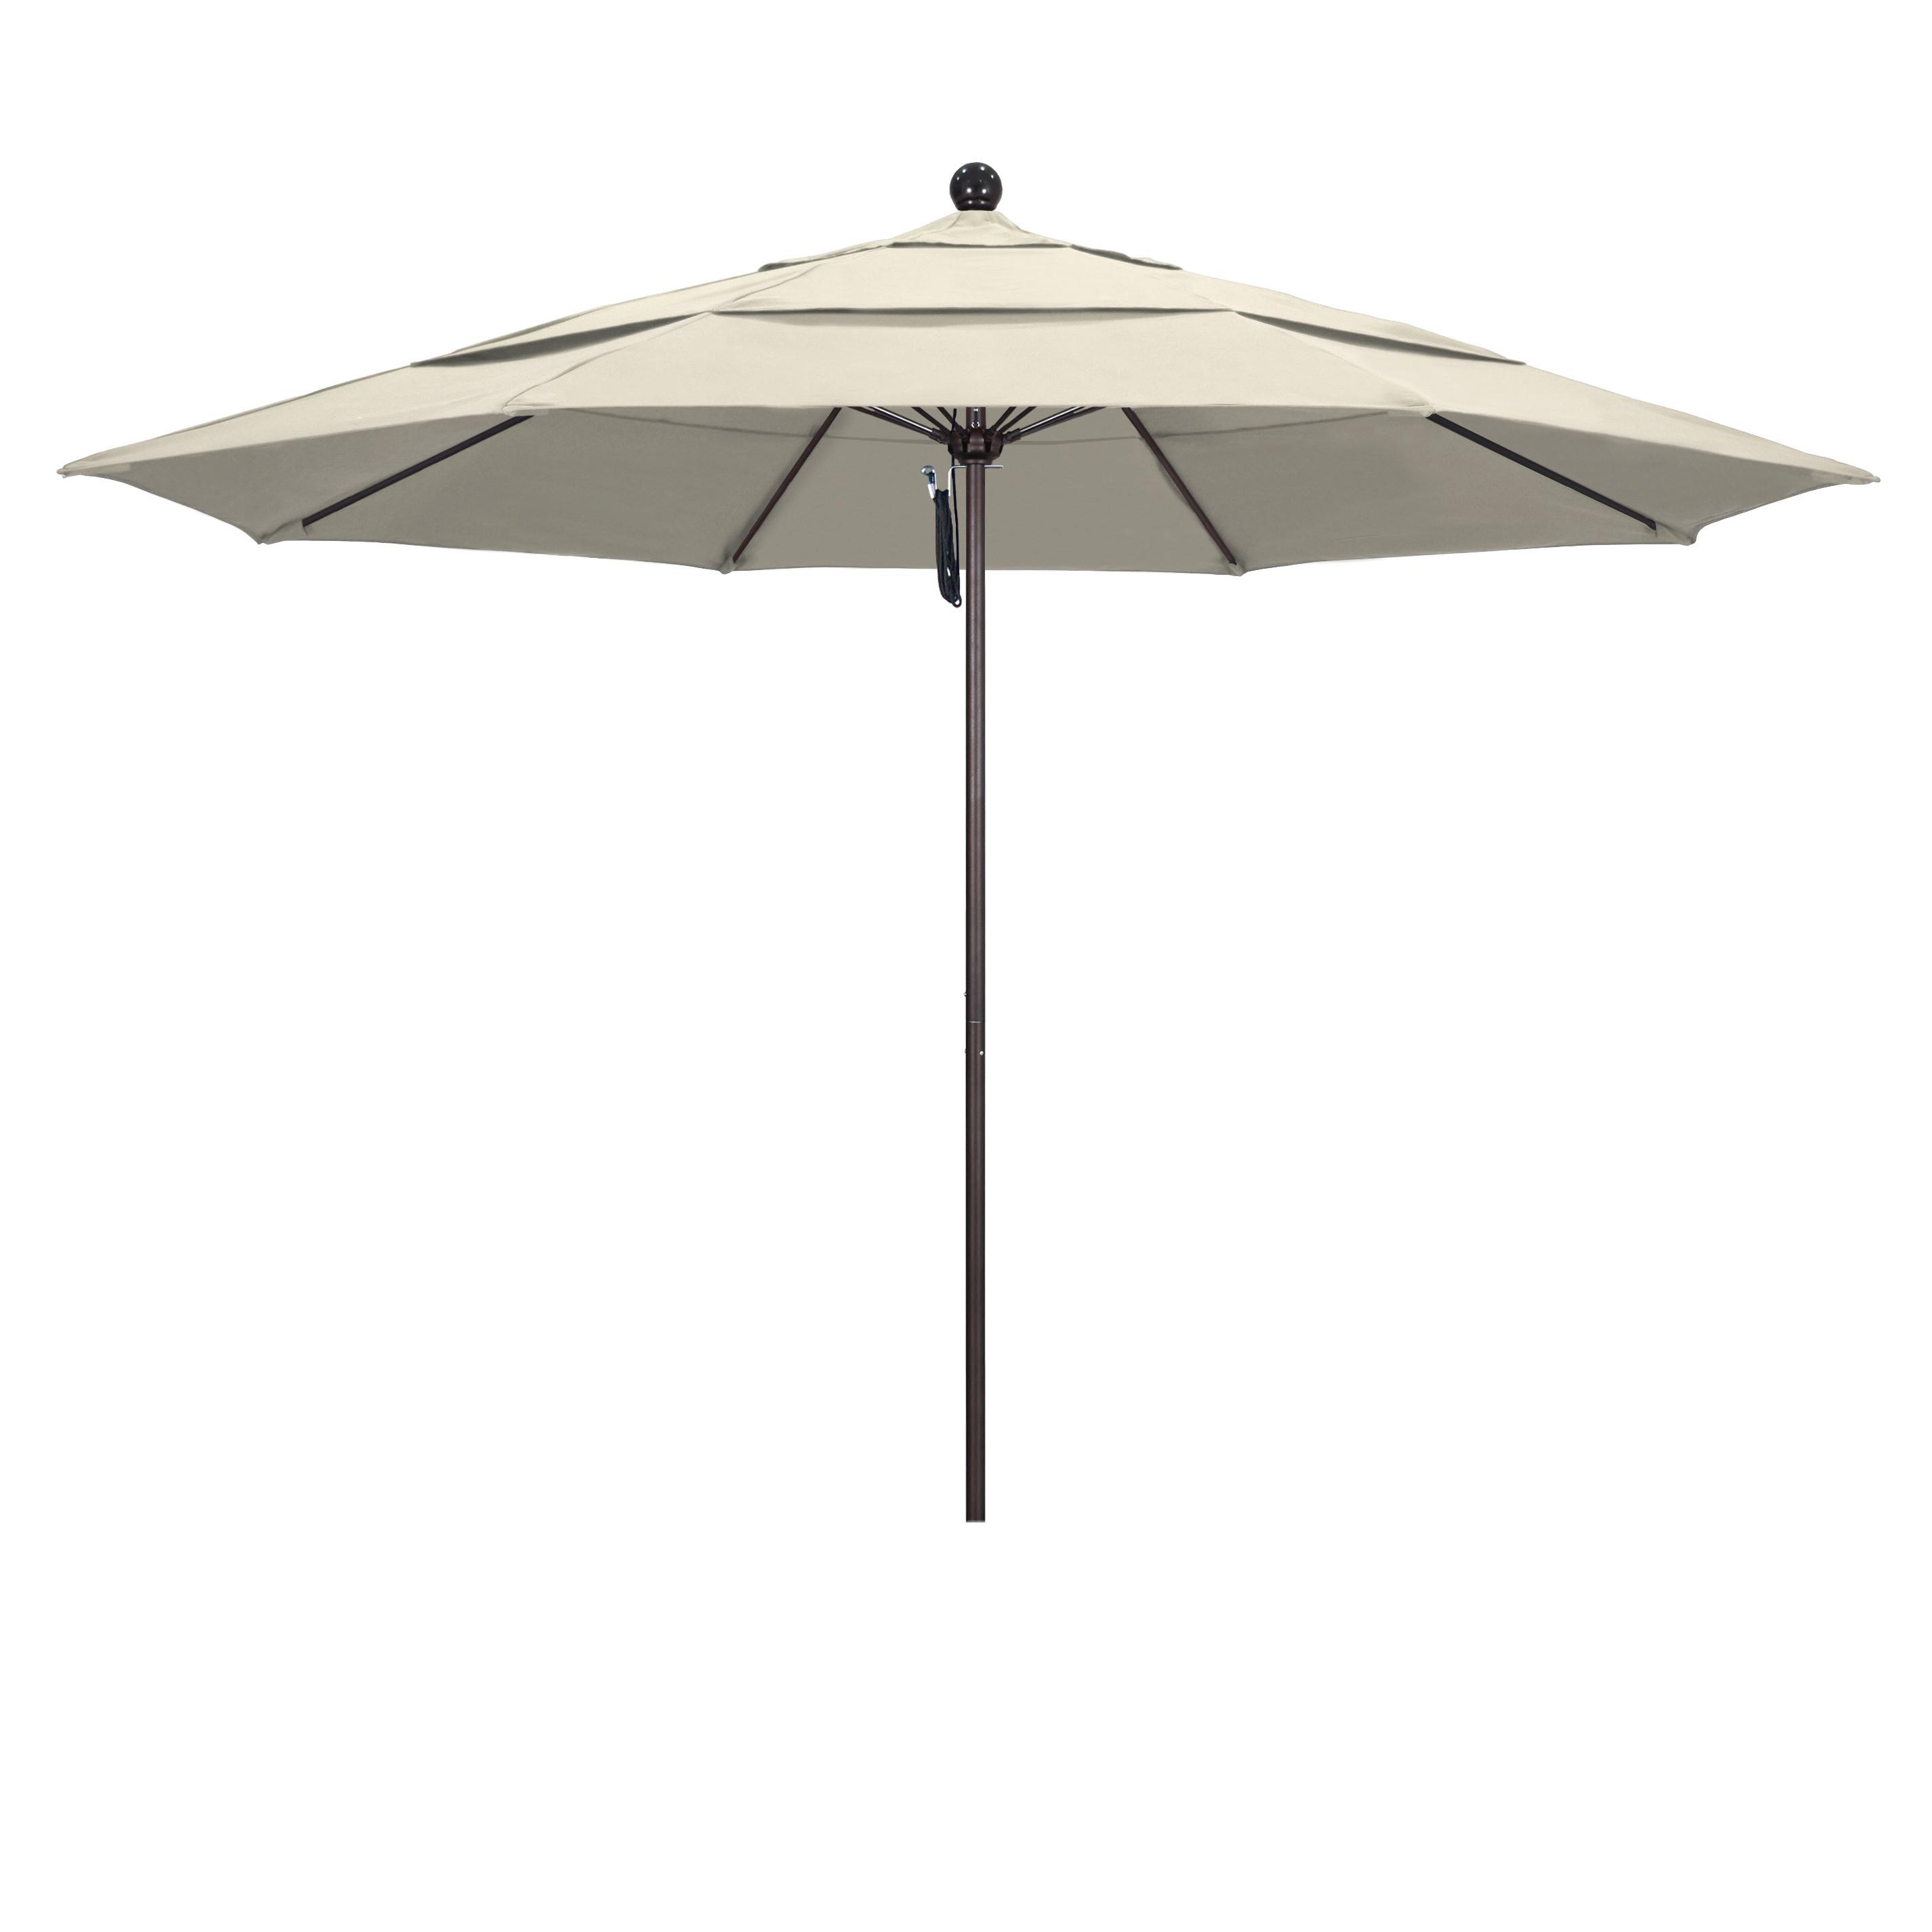 Trendy Duxbury 11' Market Umbrella Regarding Mraz Market Umbrellas (View 18 of 20)